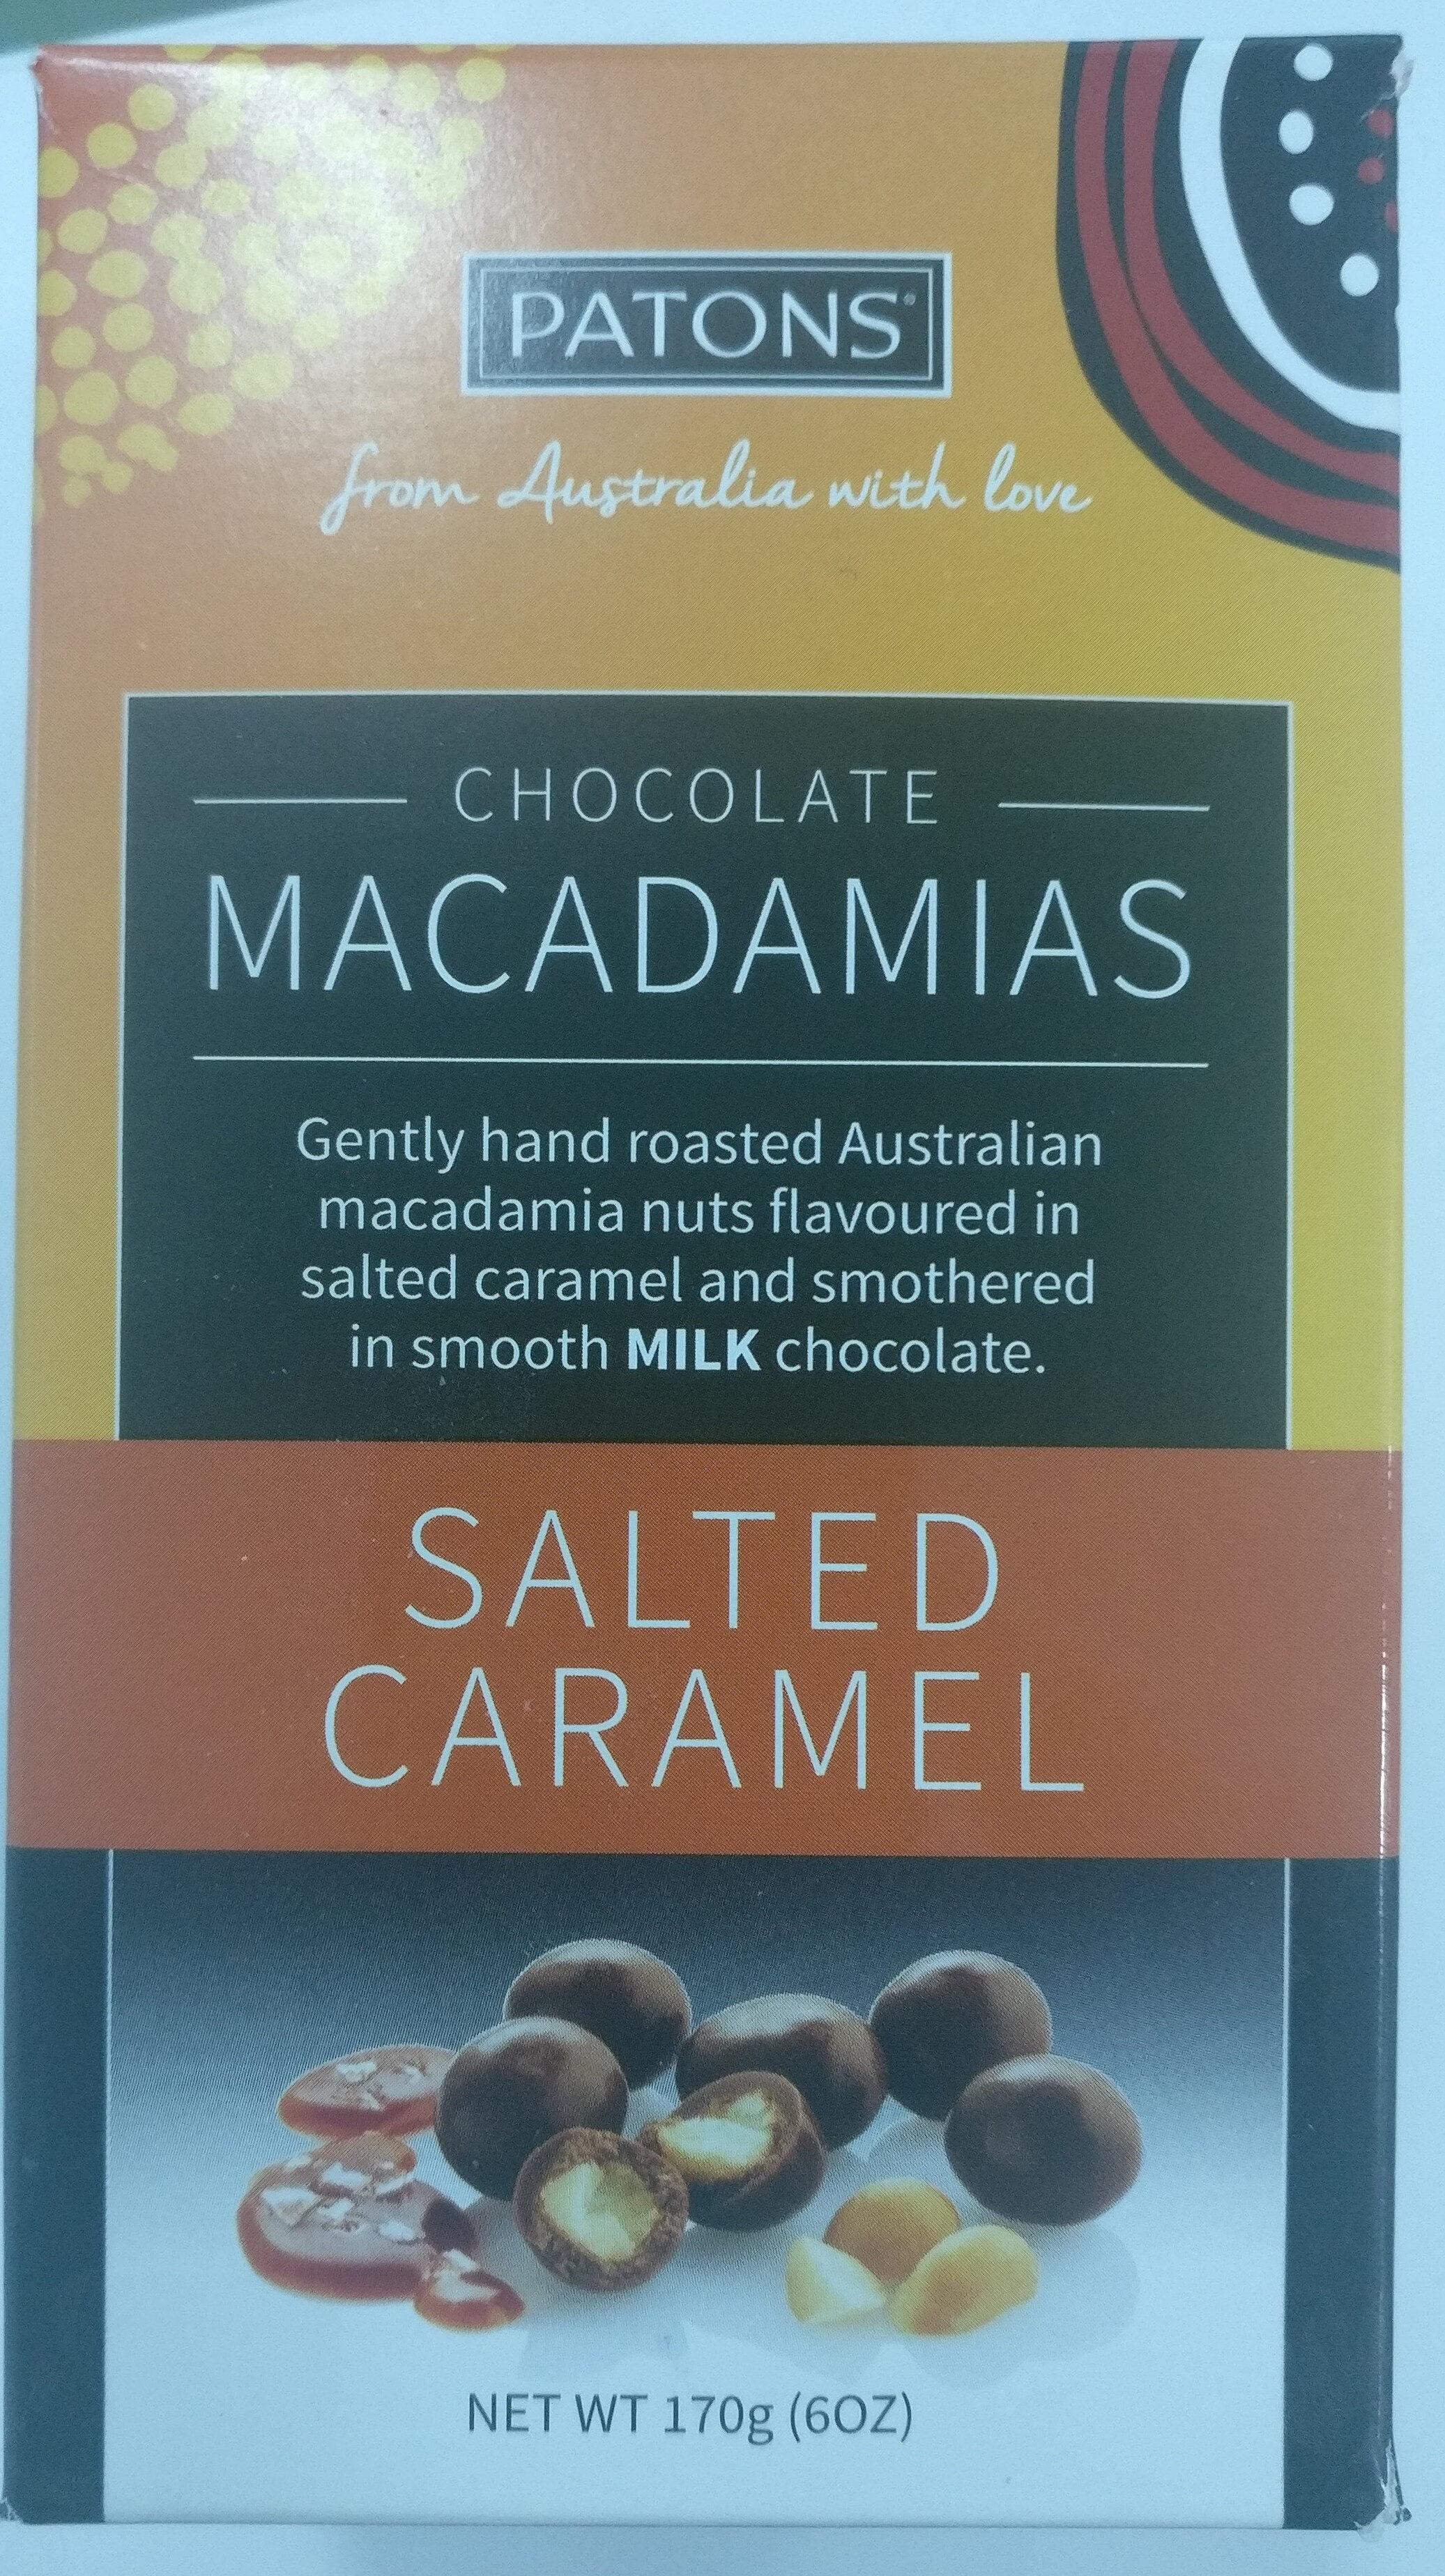 Chocolate Macadamias Salted Caramel - Product - en